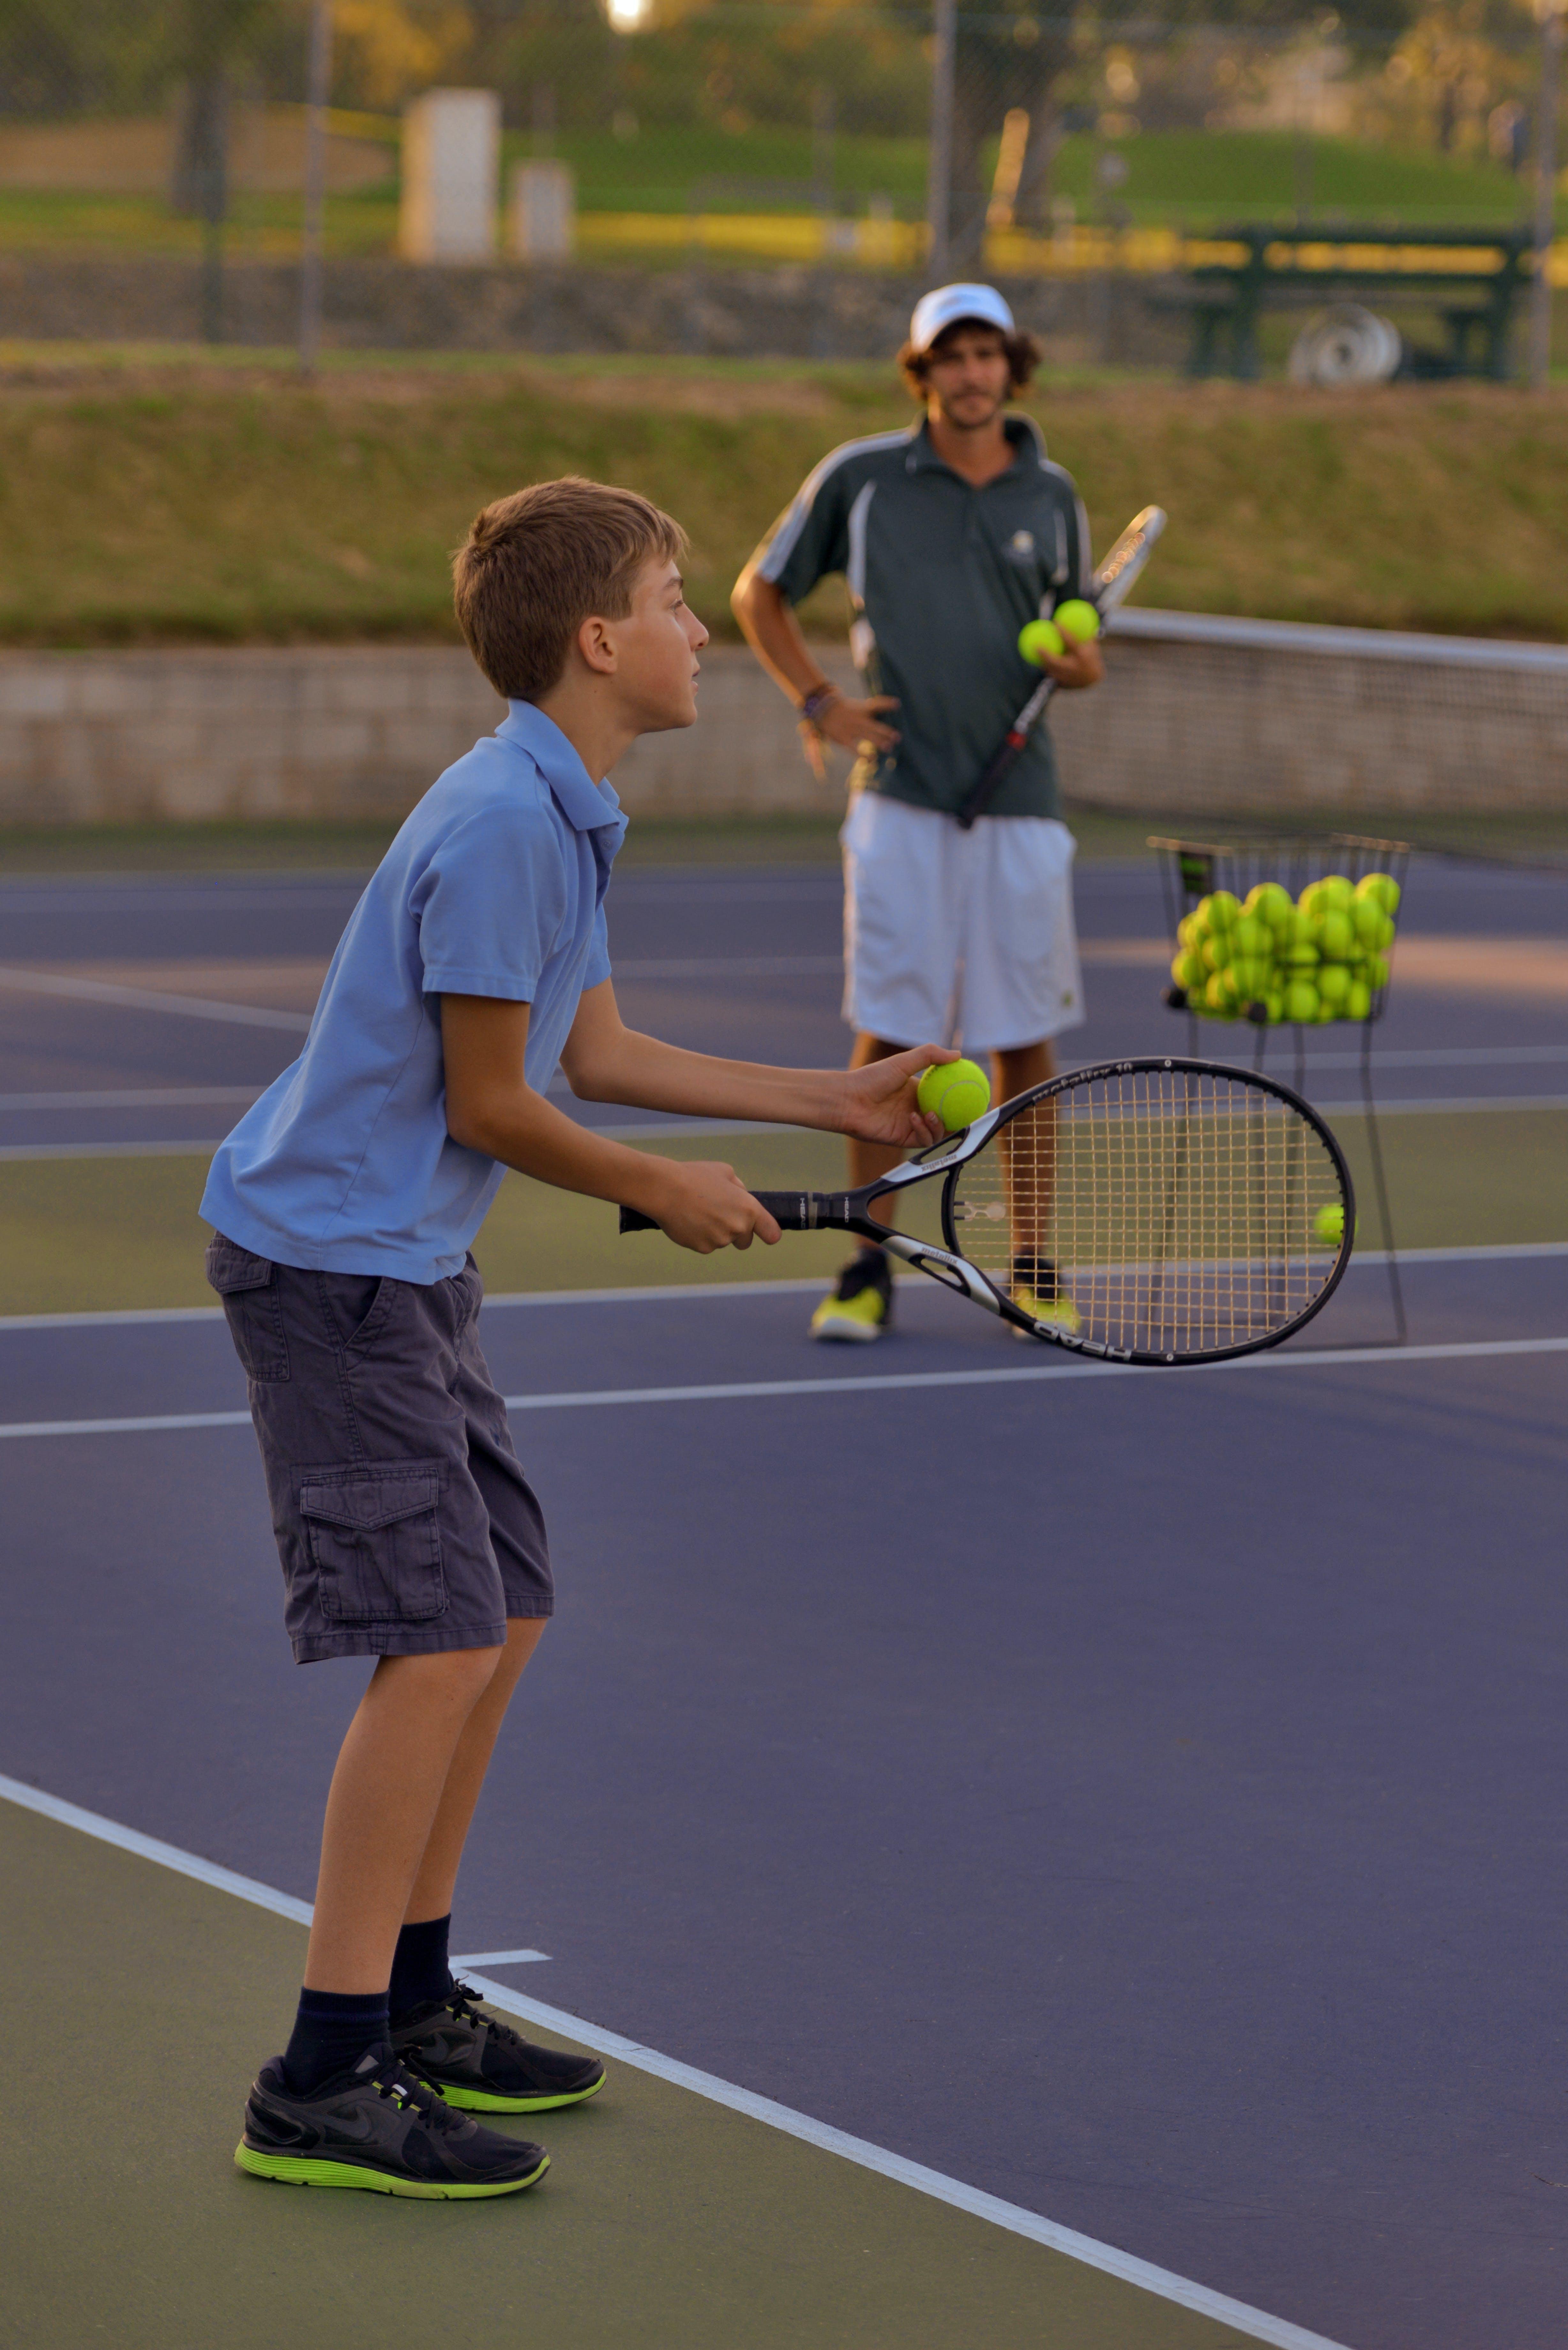 Nedlands/Dalkeith Tennis Club